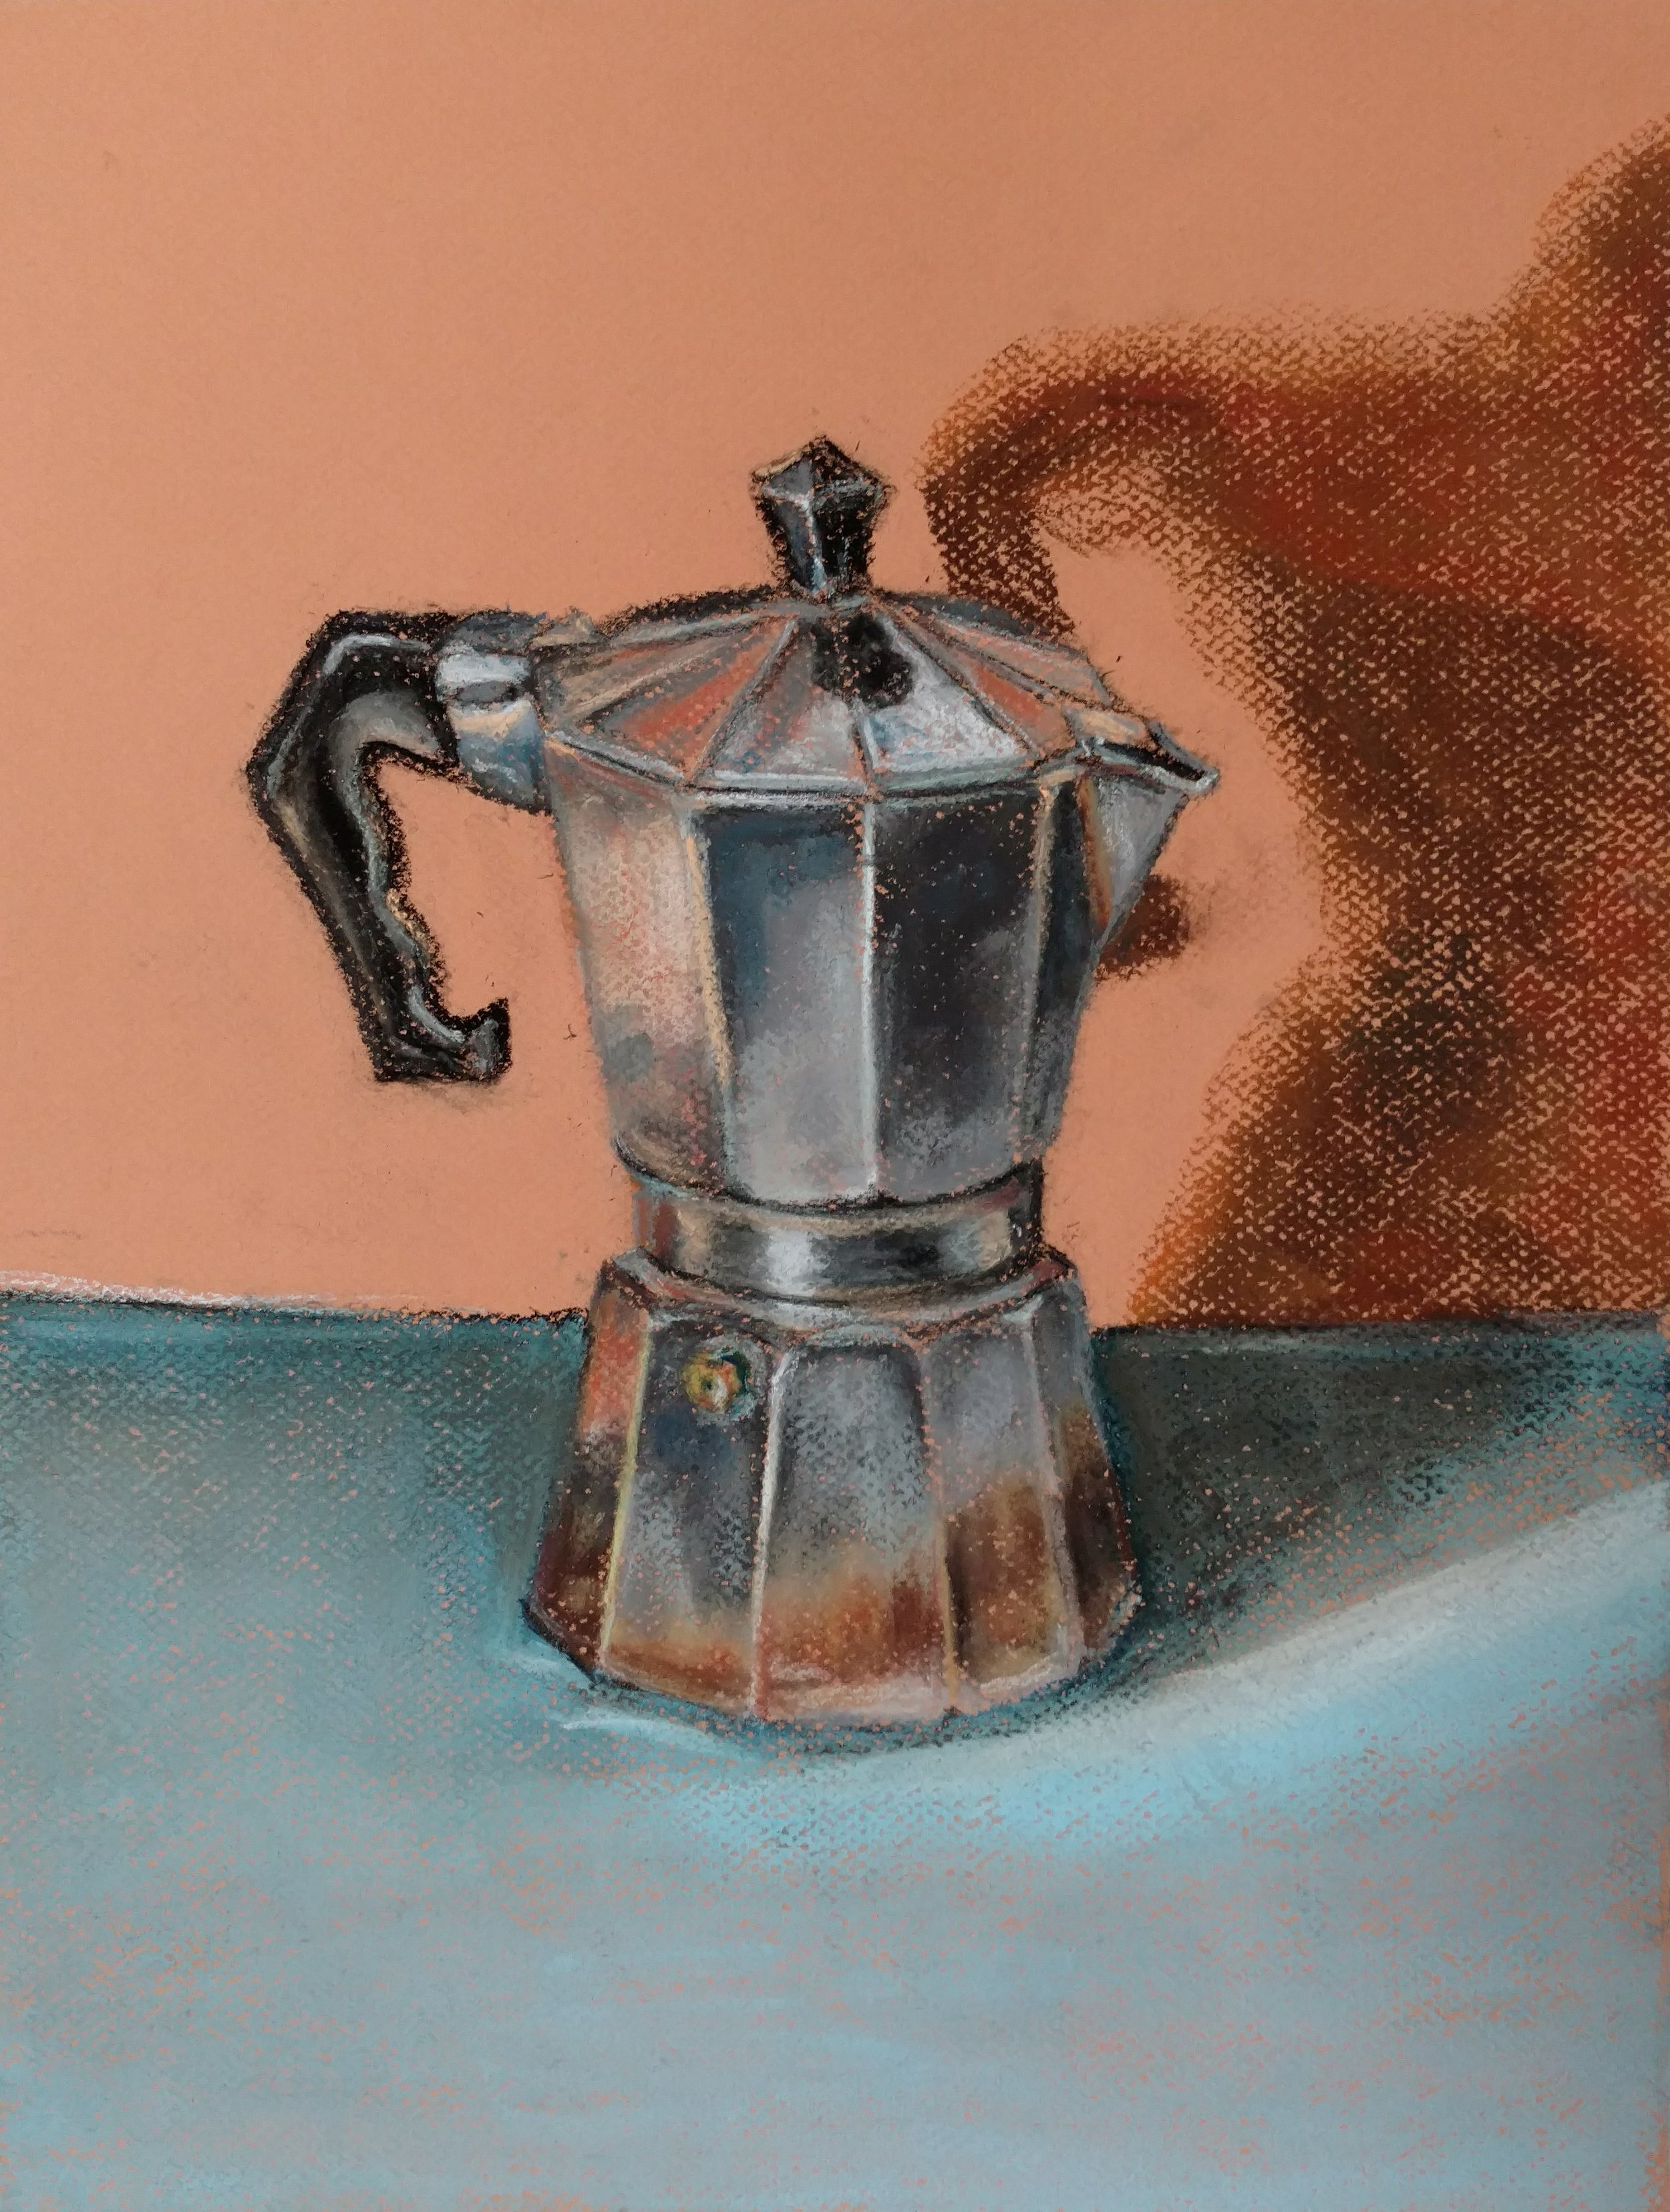 Coffee urn, Phil Tesinsky, 2018  Chalk pastel on Mitientes paper